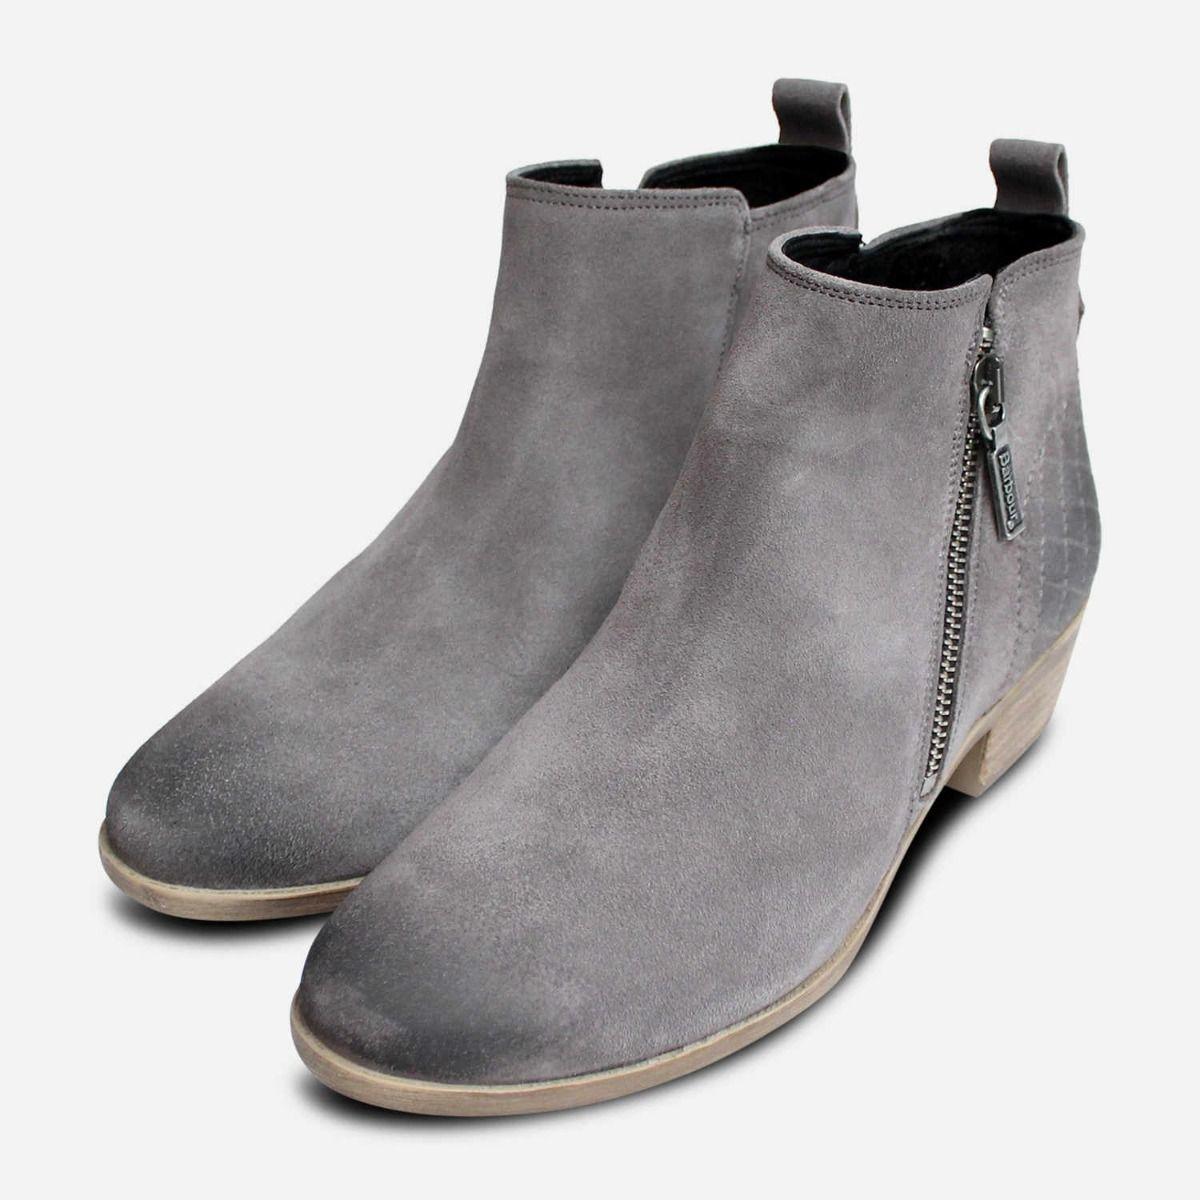 Barbour Designer Ankle Zip Boots in